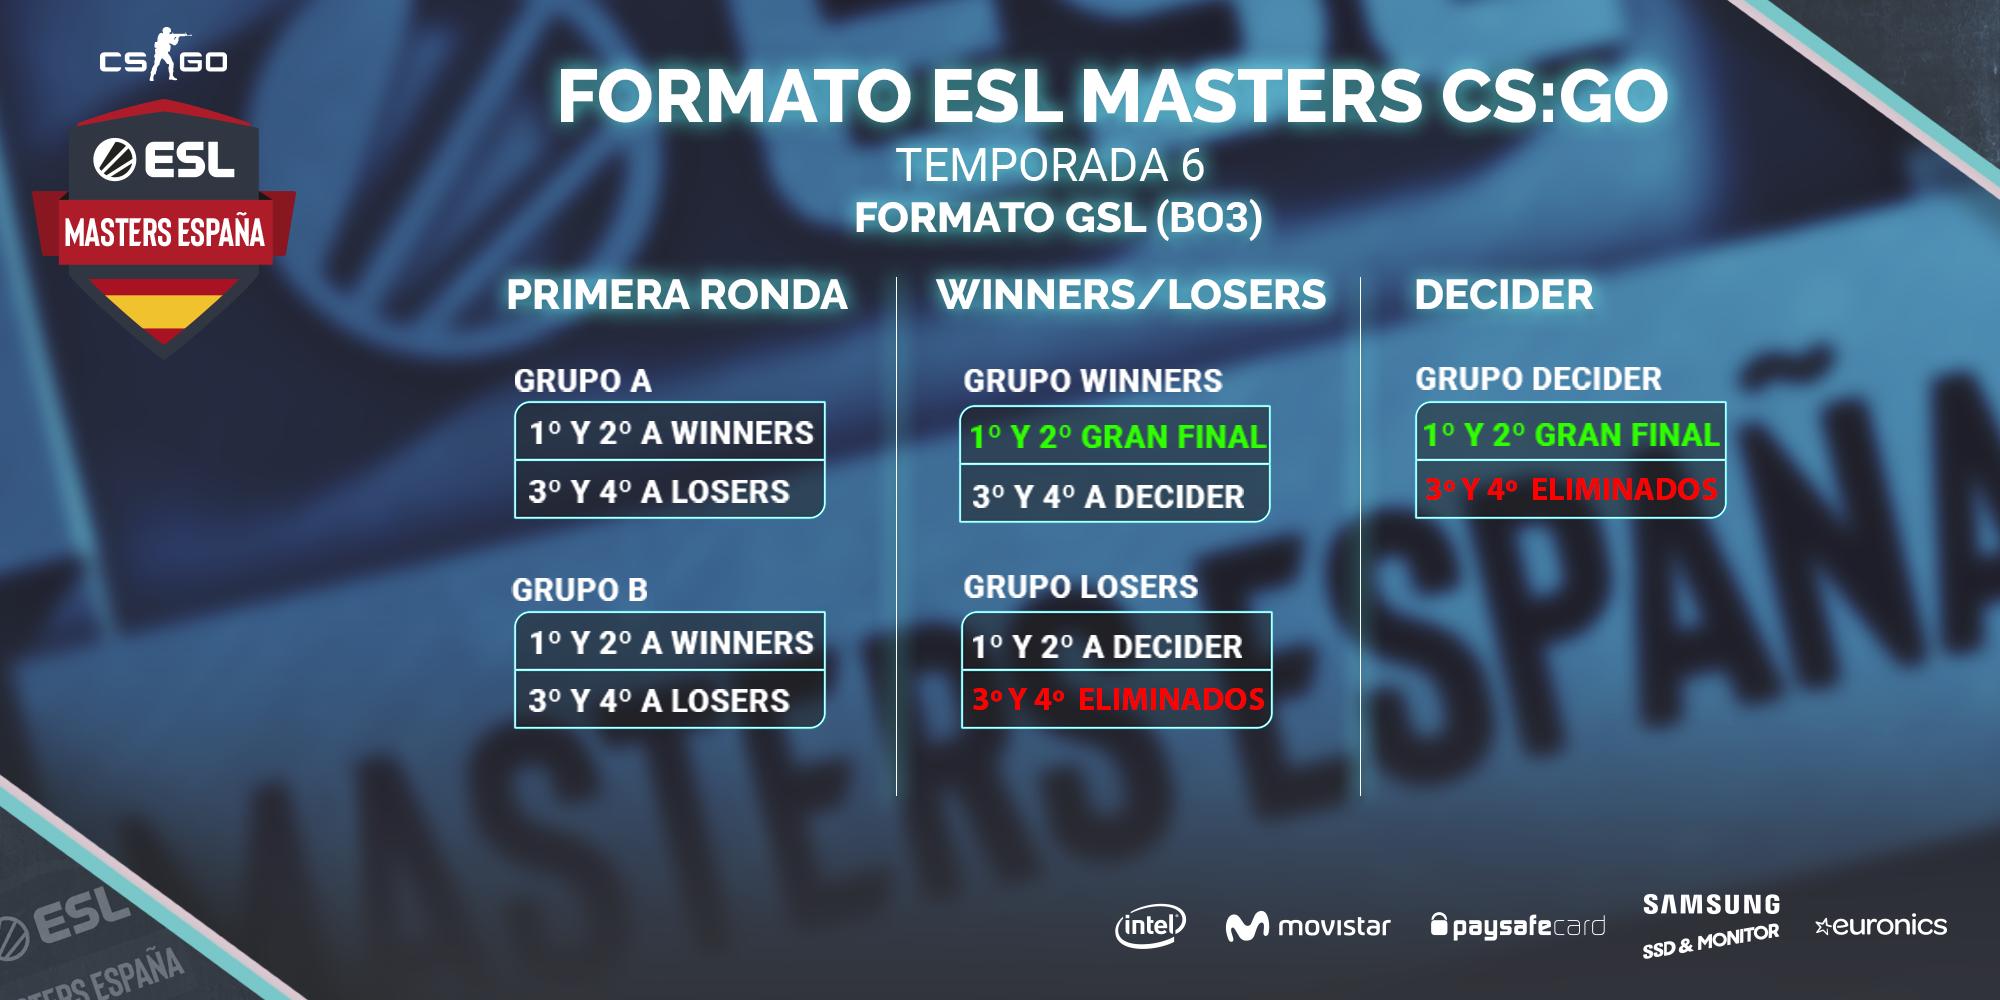 ESL Masters CS:GO Formato